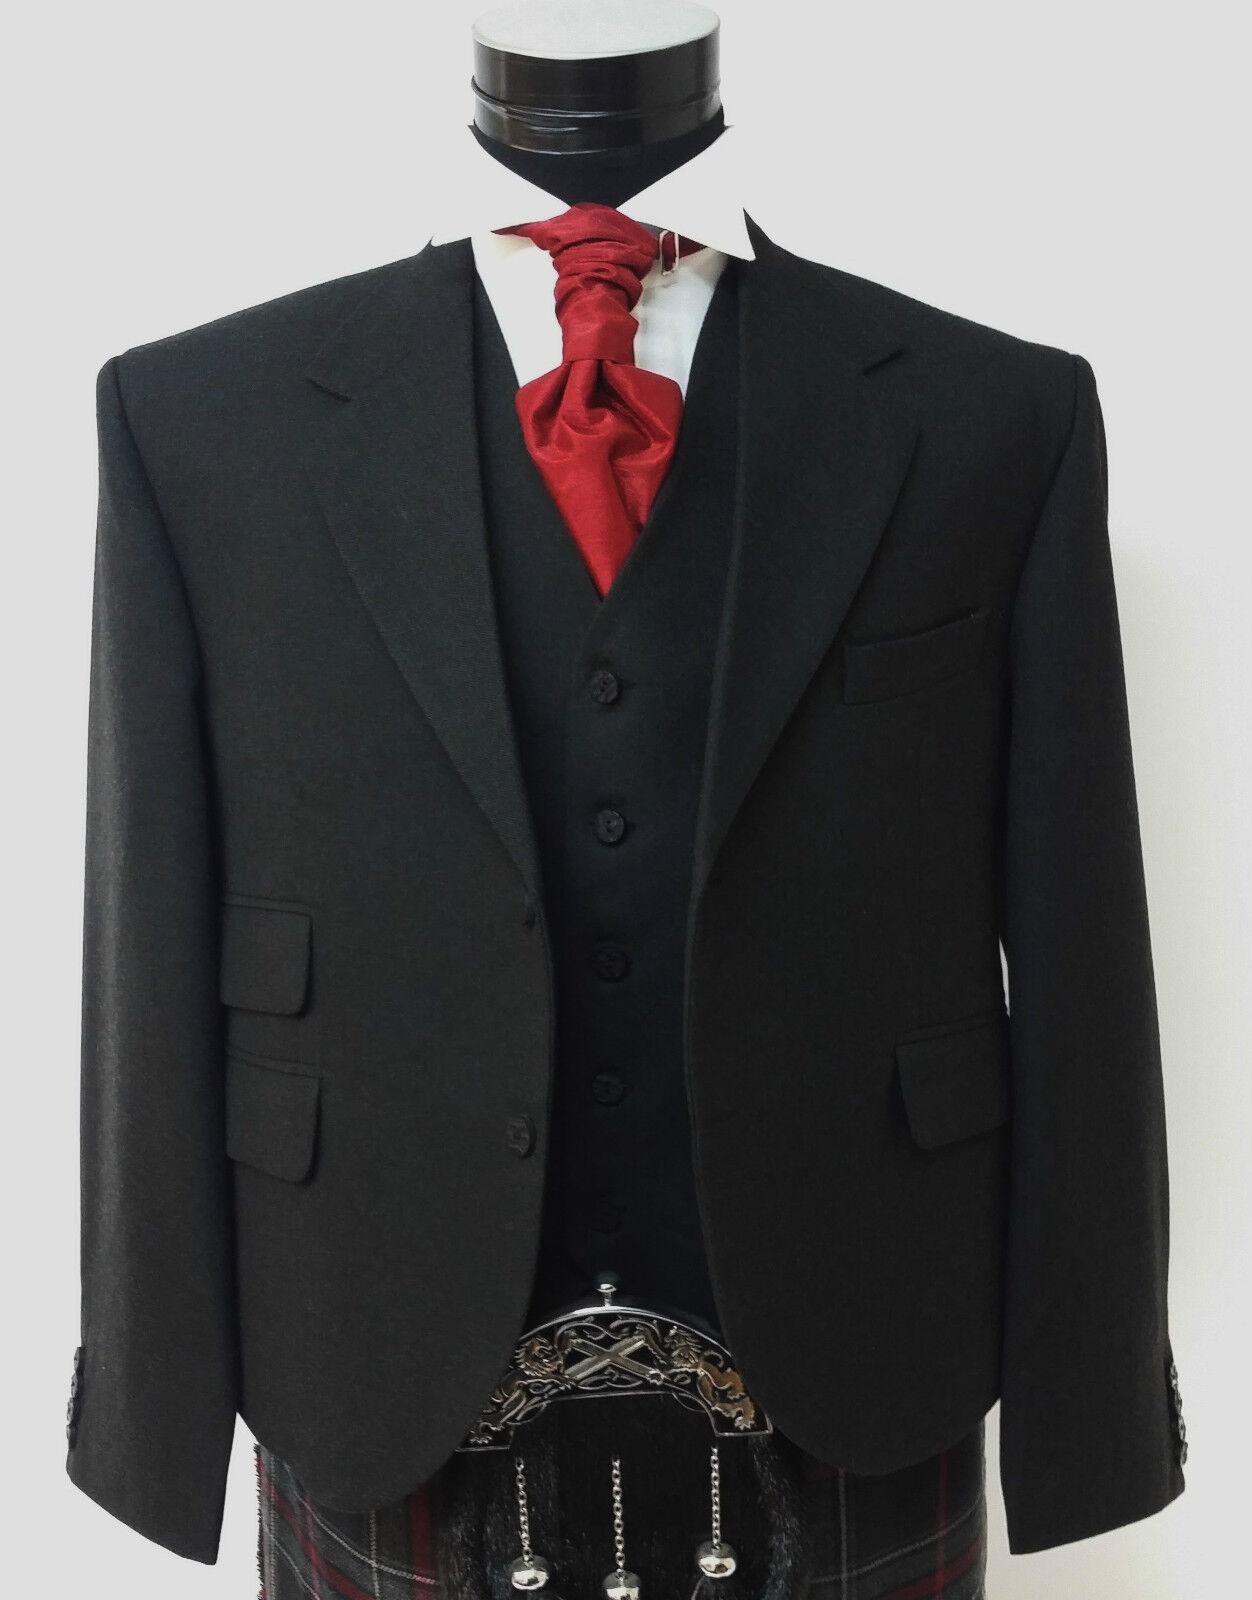 Black Day Jacket & Vest Waistcoat Quality Contemporary Formal Kilt Jacket & Vest